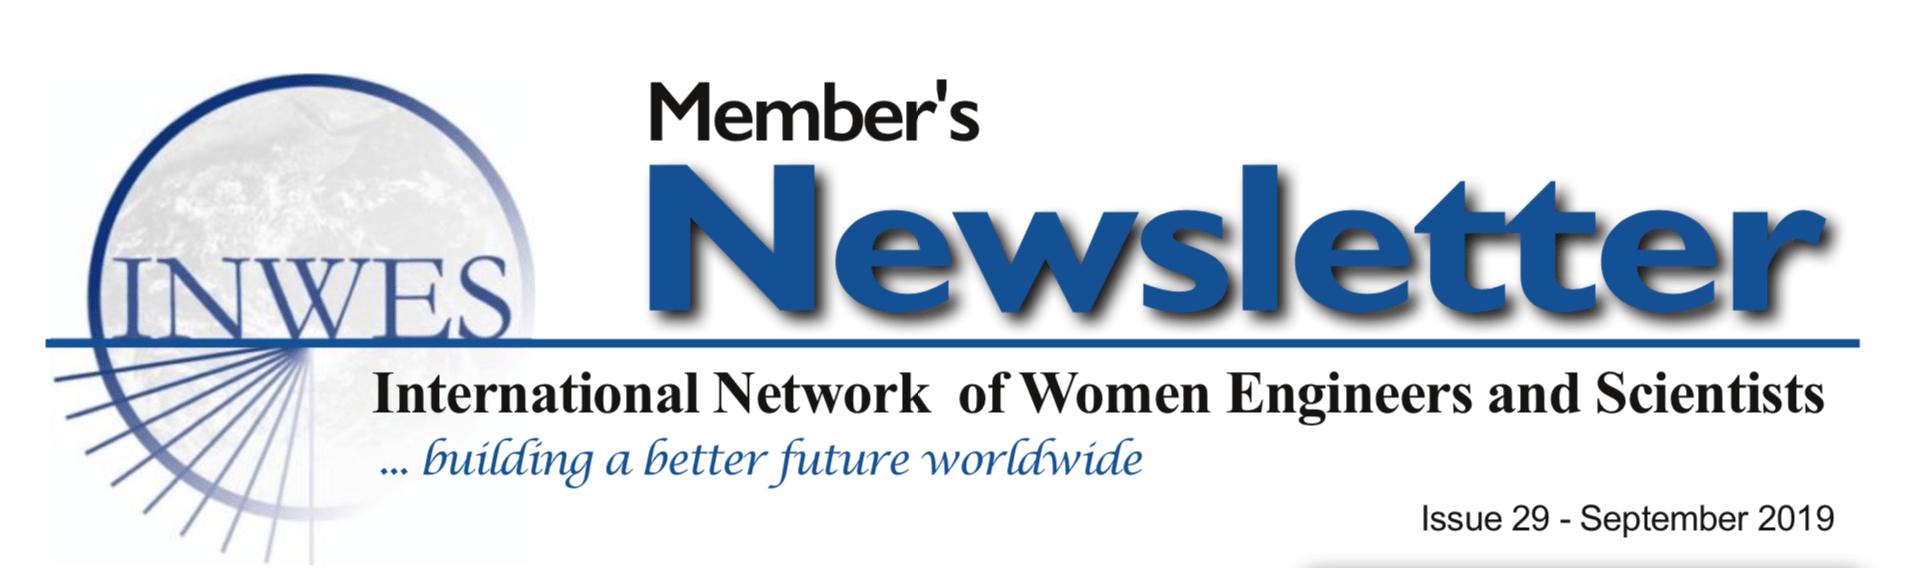 INWES Newsletter # 29